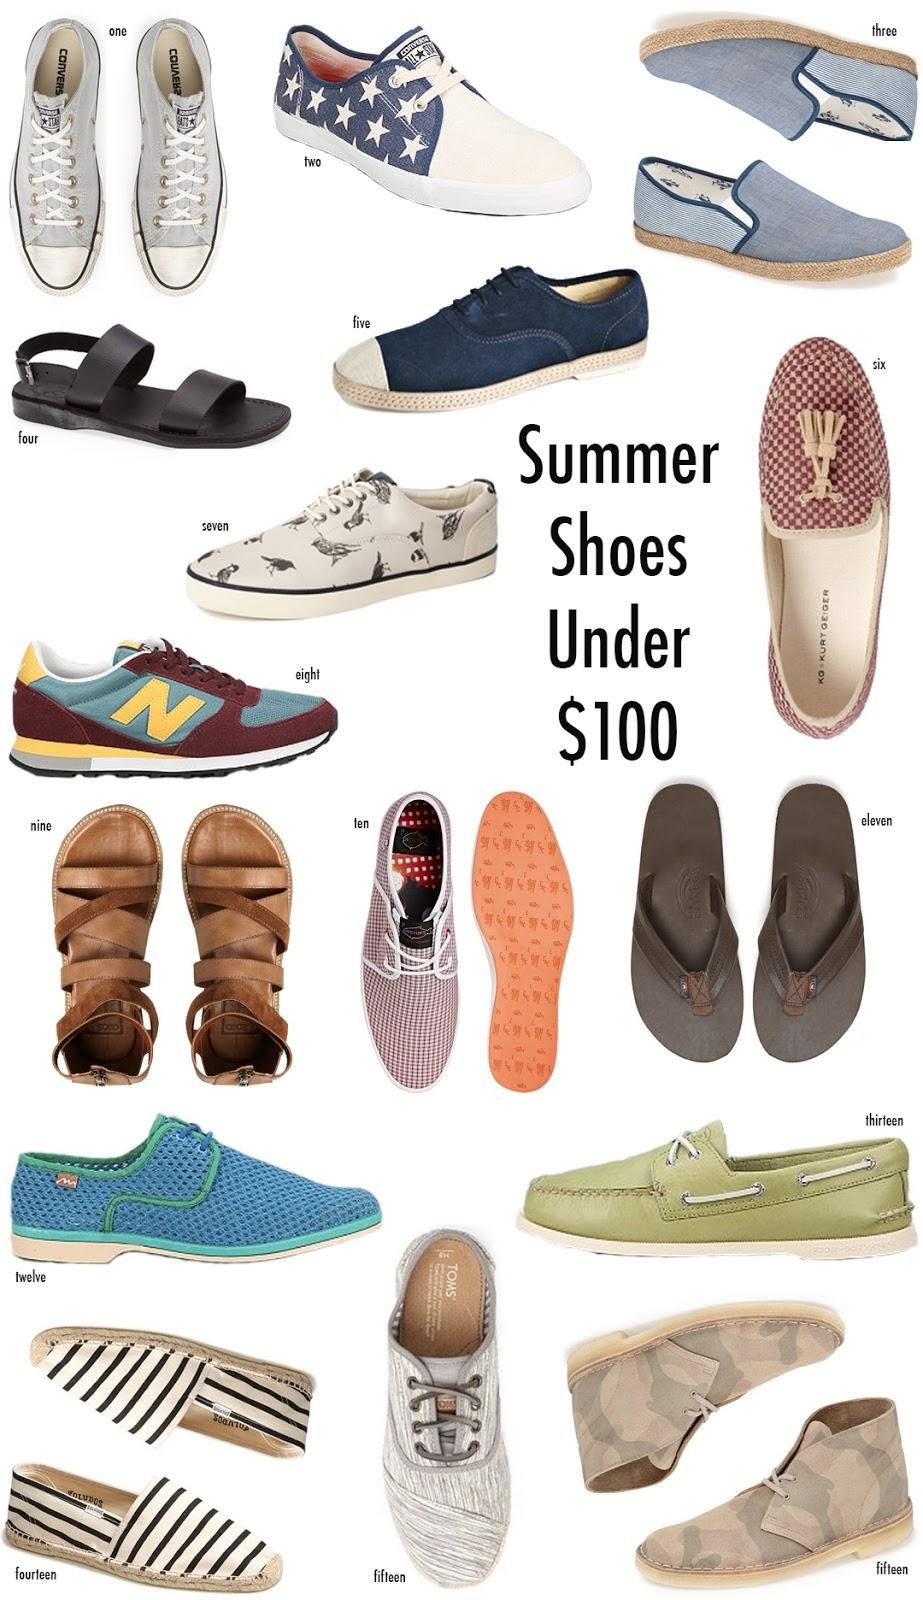 Summer Shoes under $100